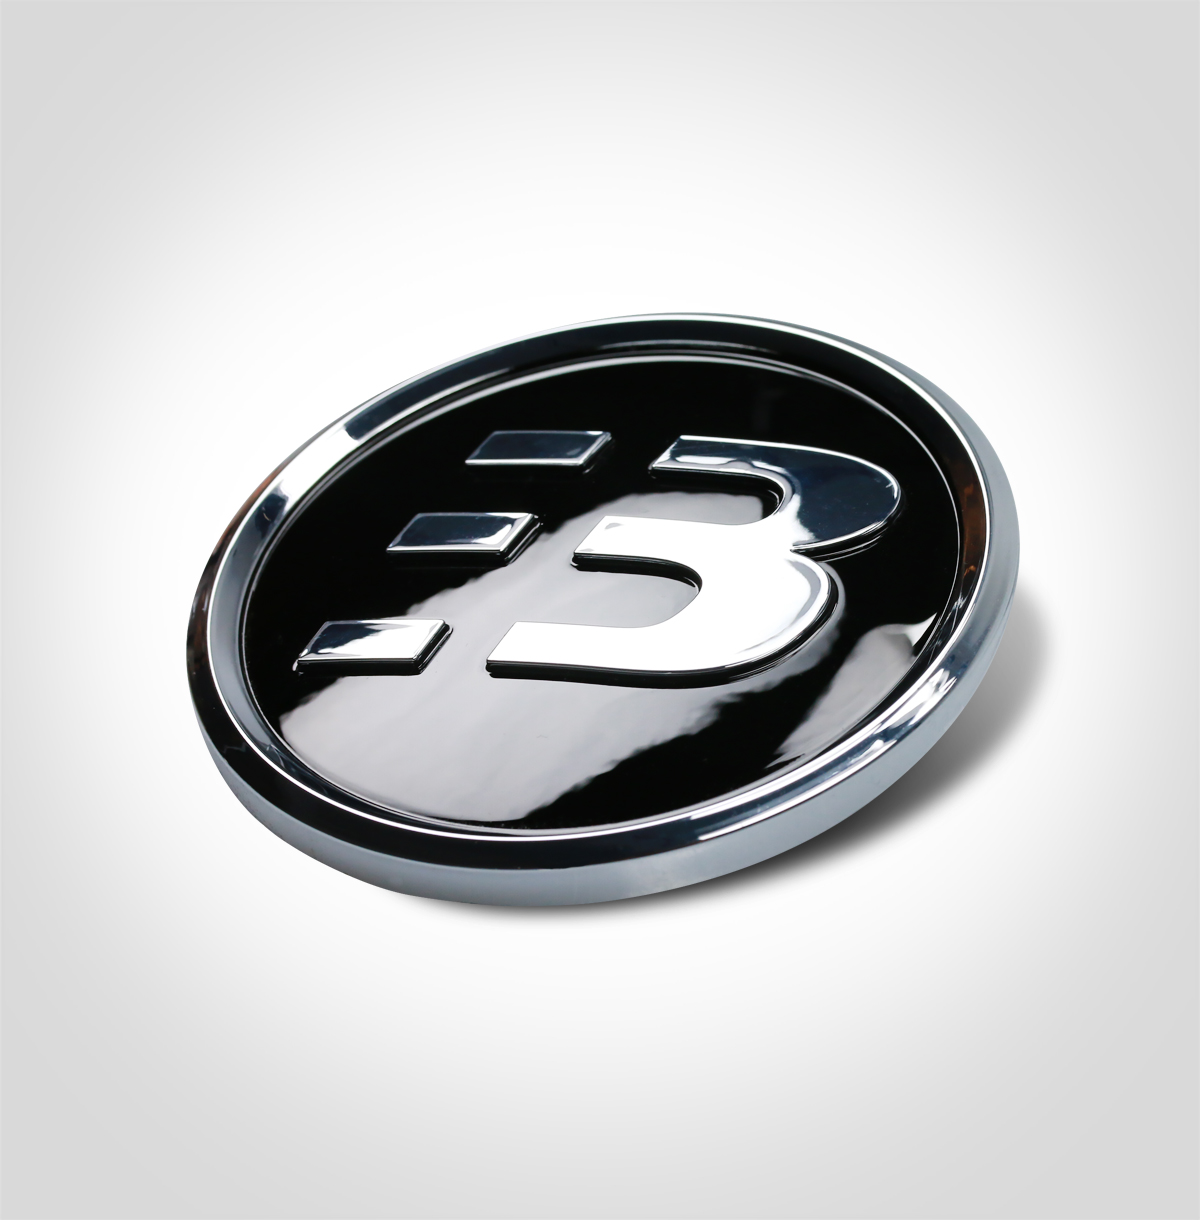 Bild: Kunstoff Spritzguss Binz Logo